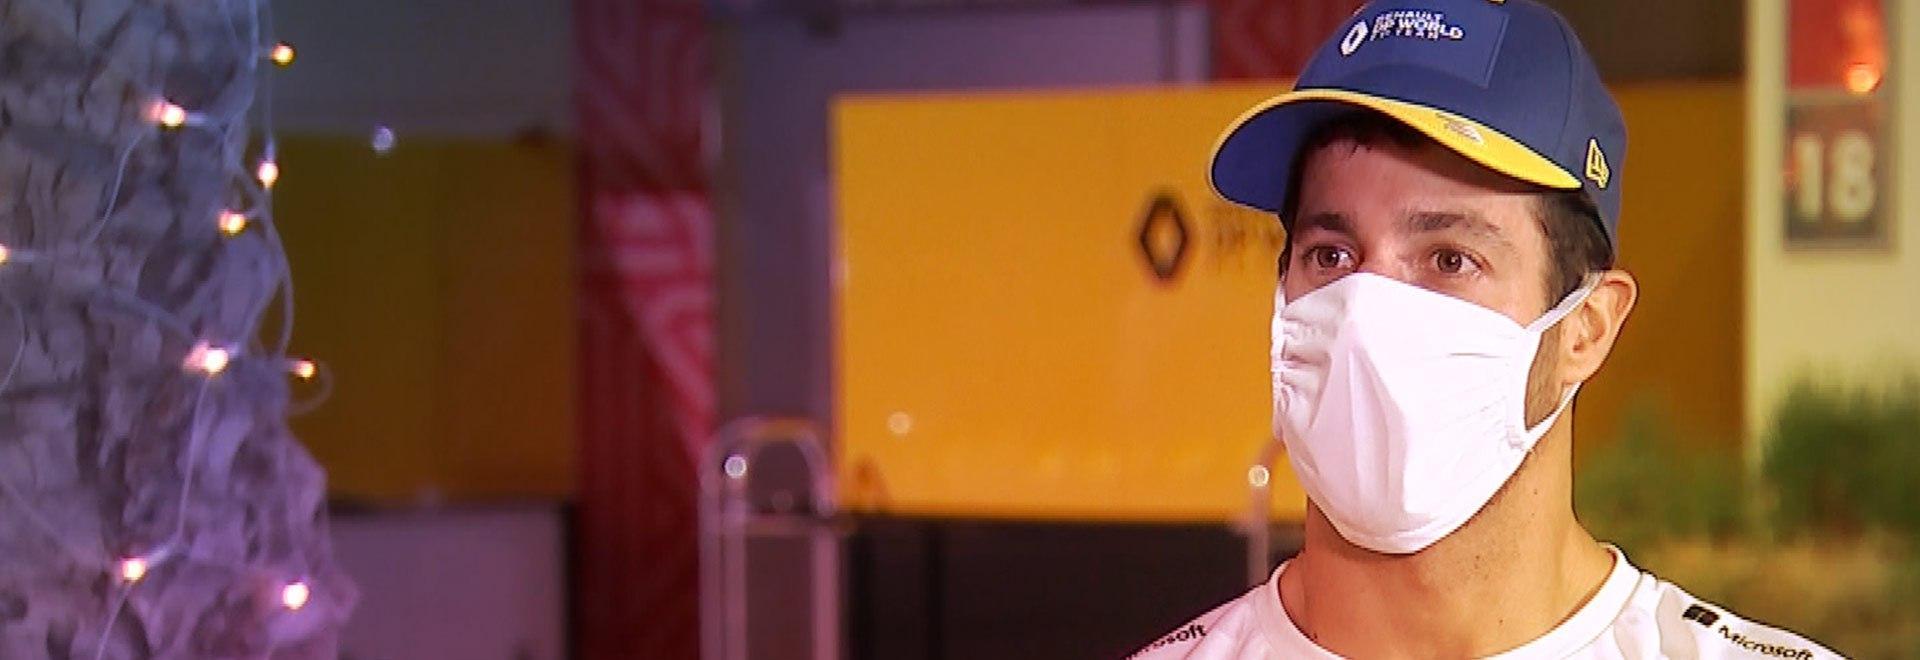 Ricciardo Quiz Show